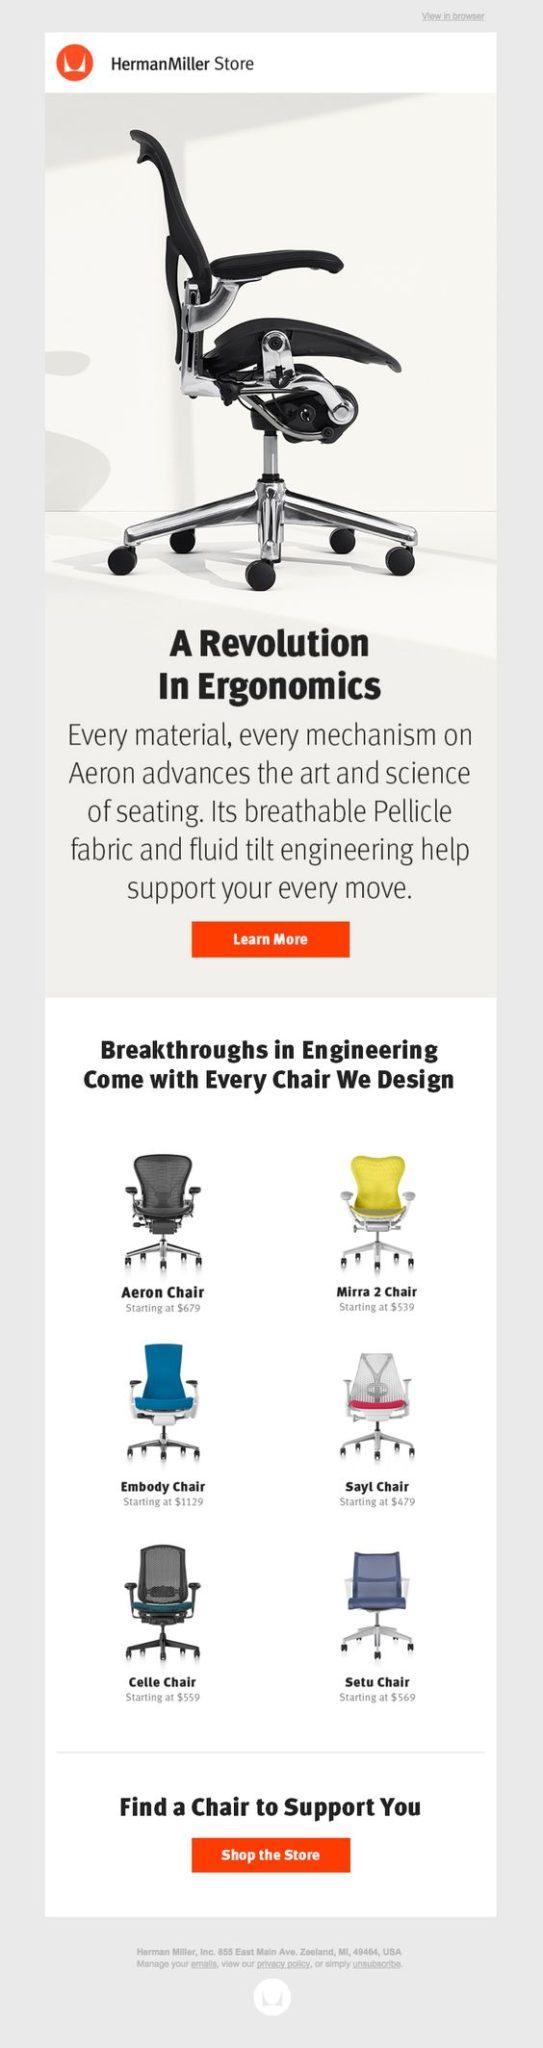 email marketing para crear imagen de marca CTA